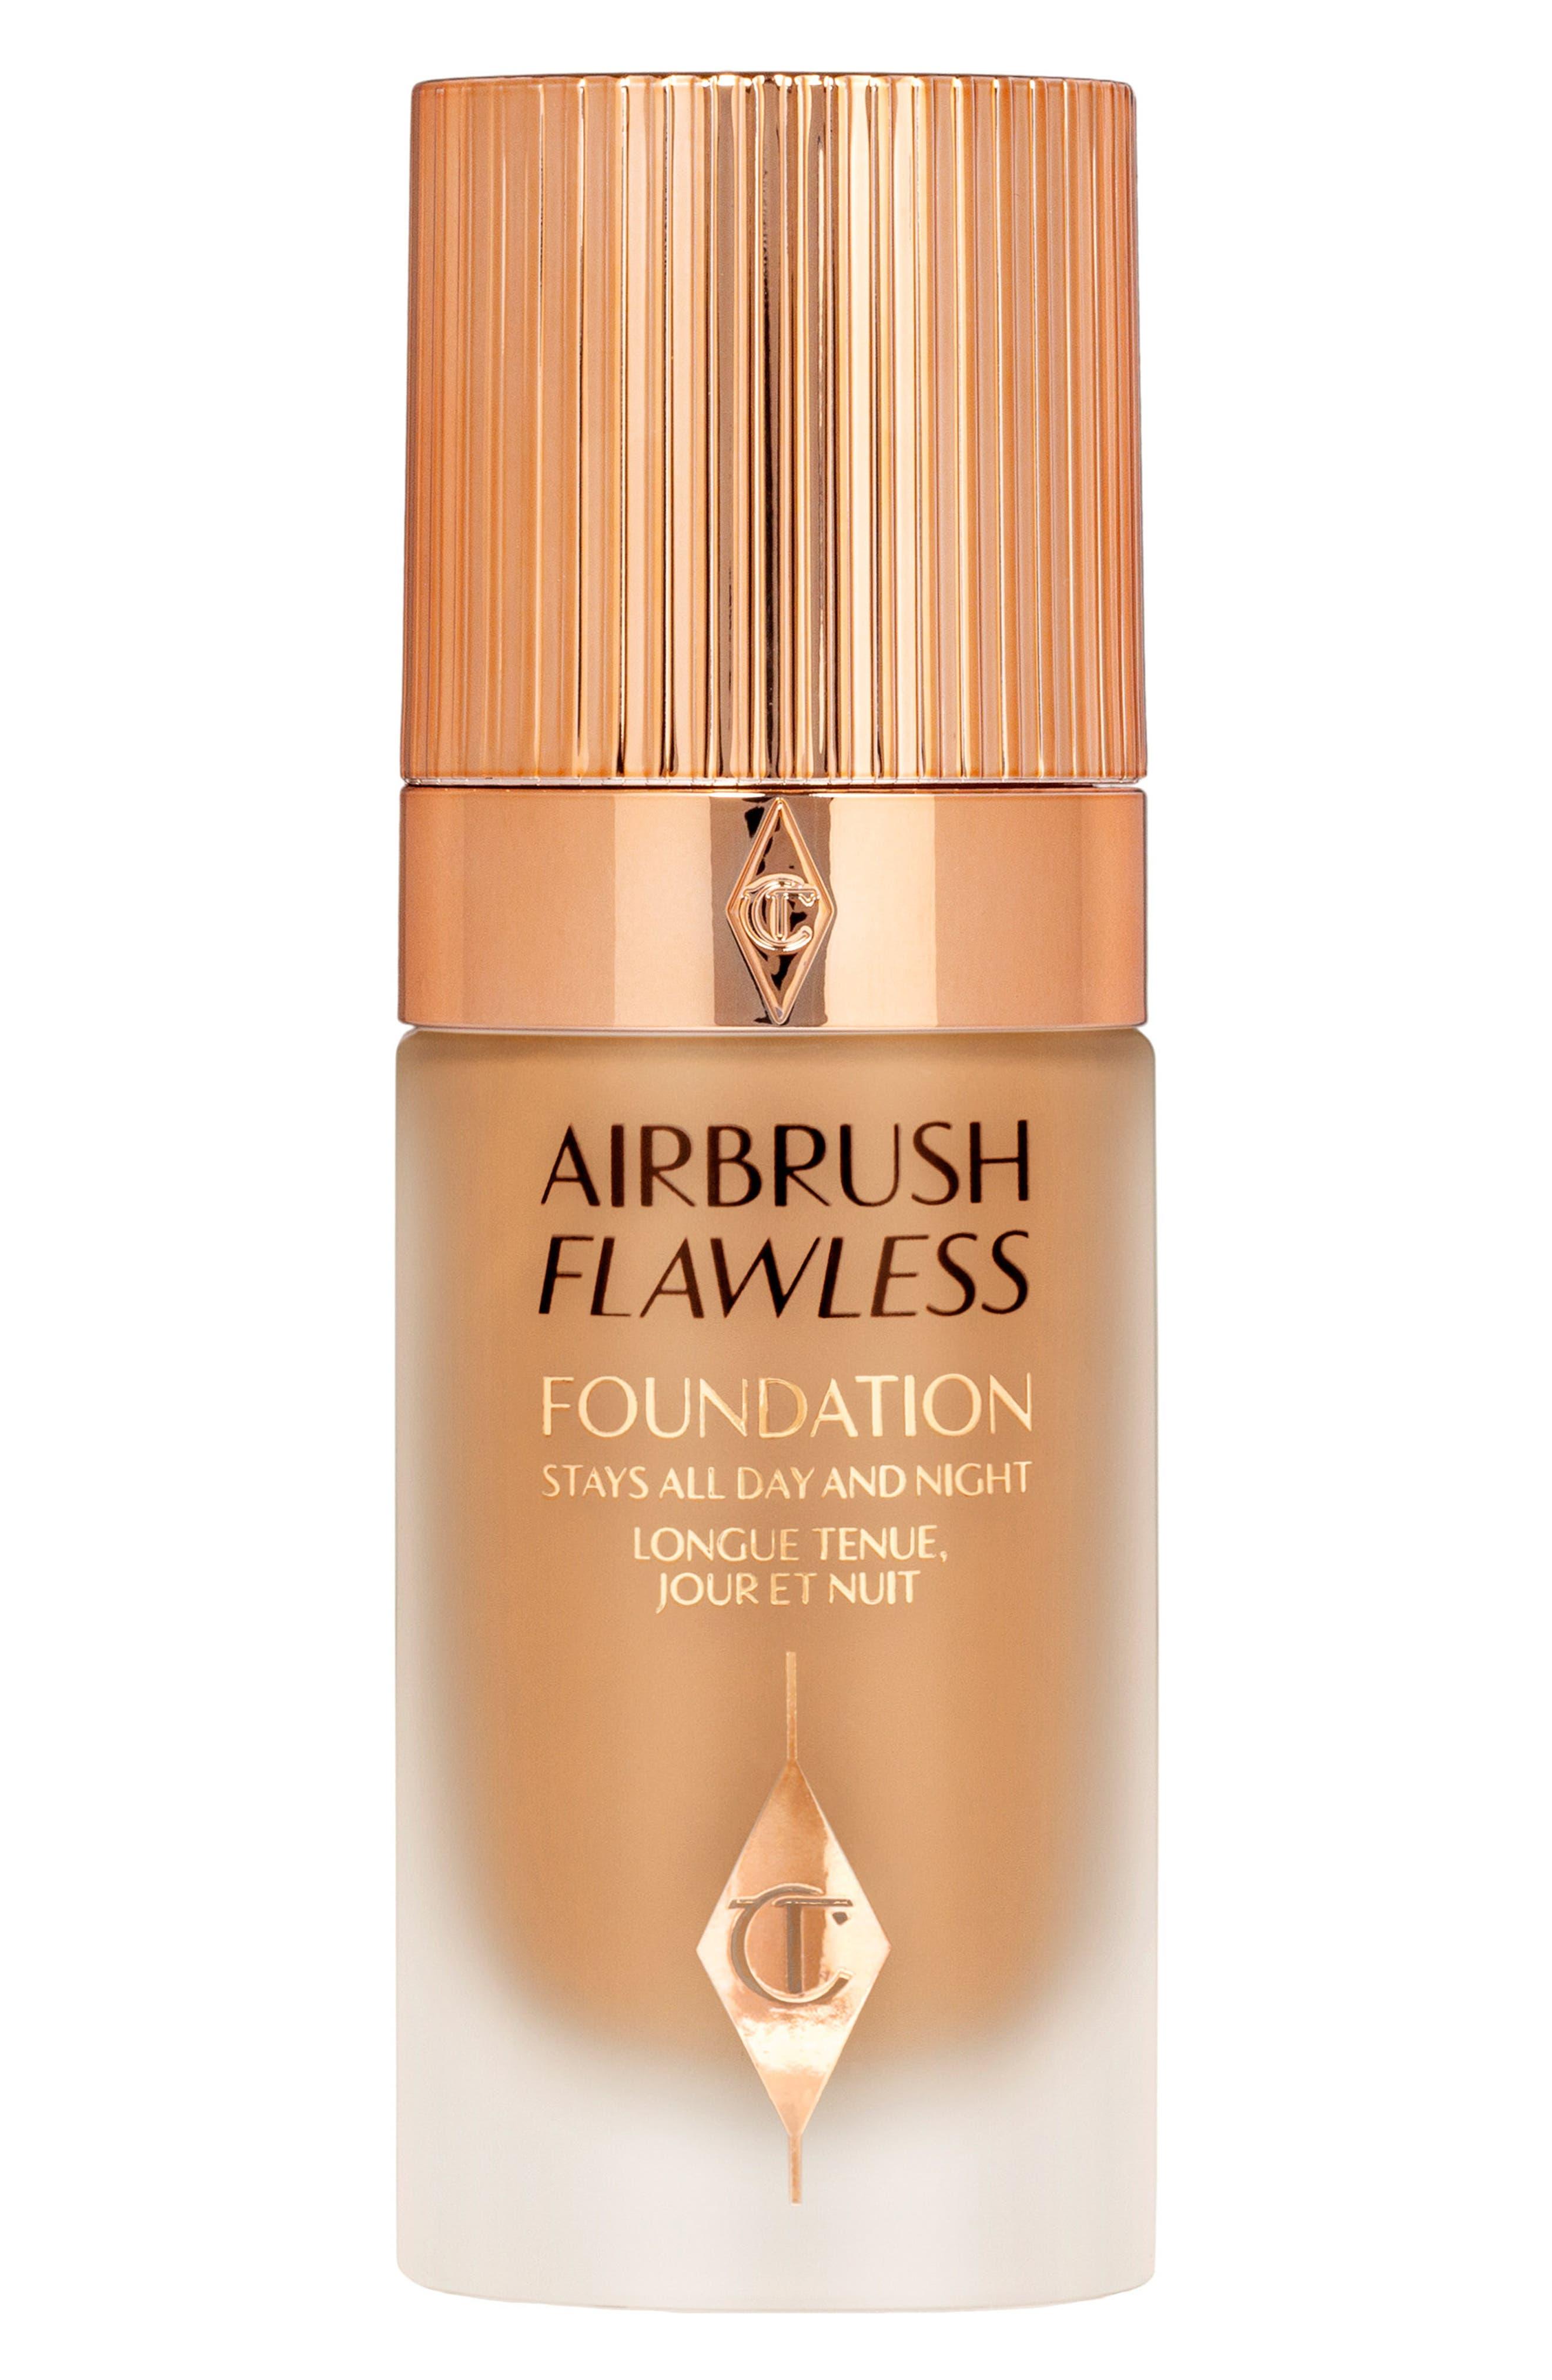 Airbrush Flawless Foundation